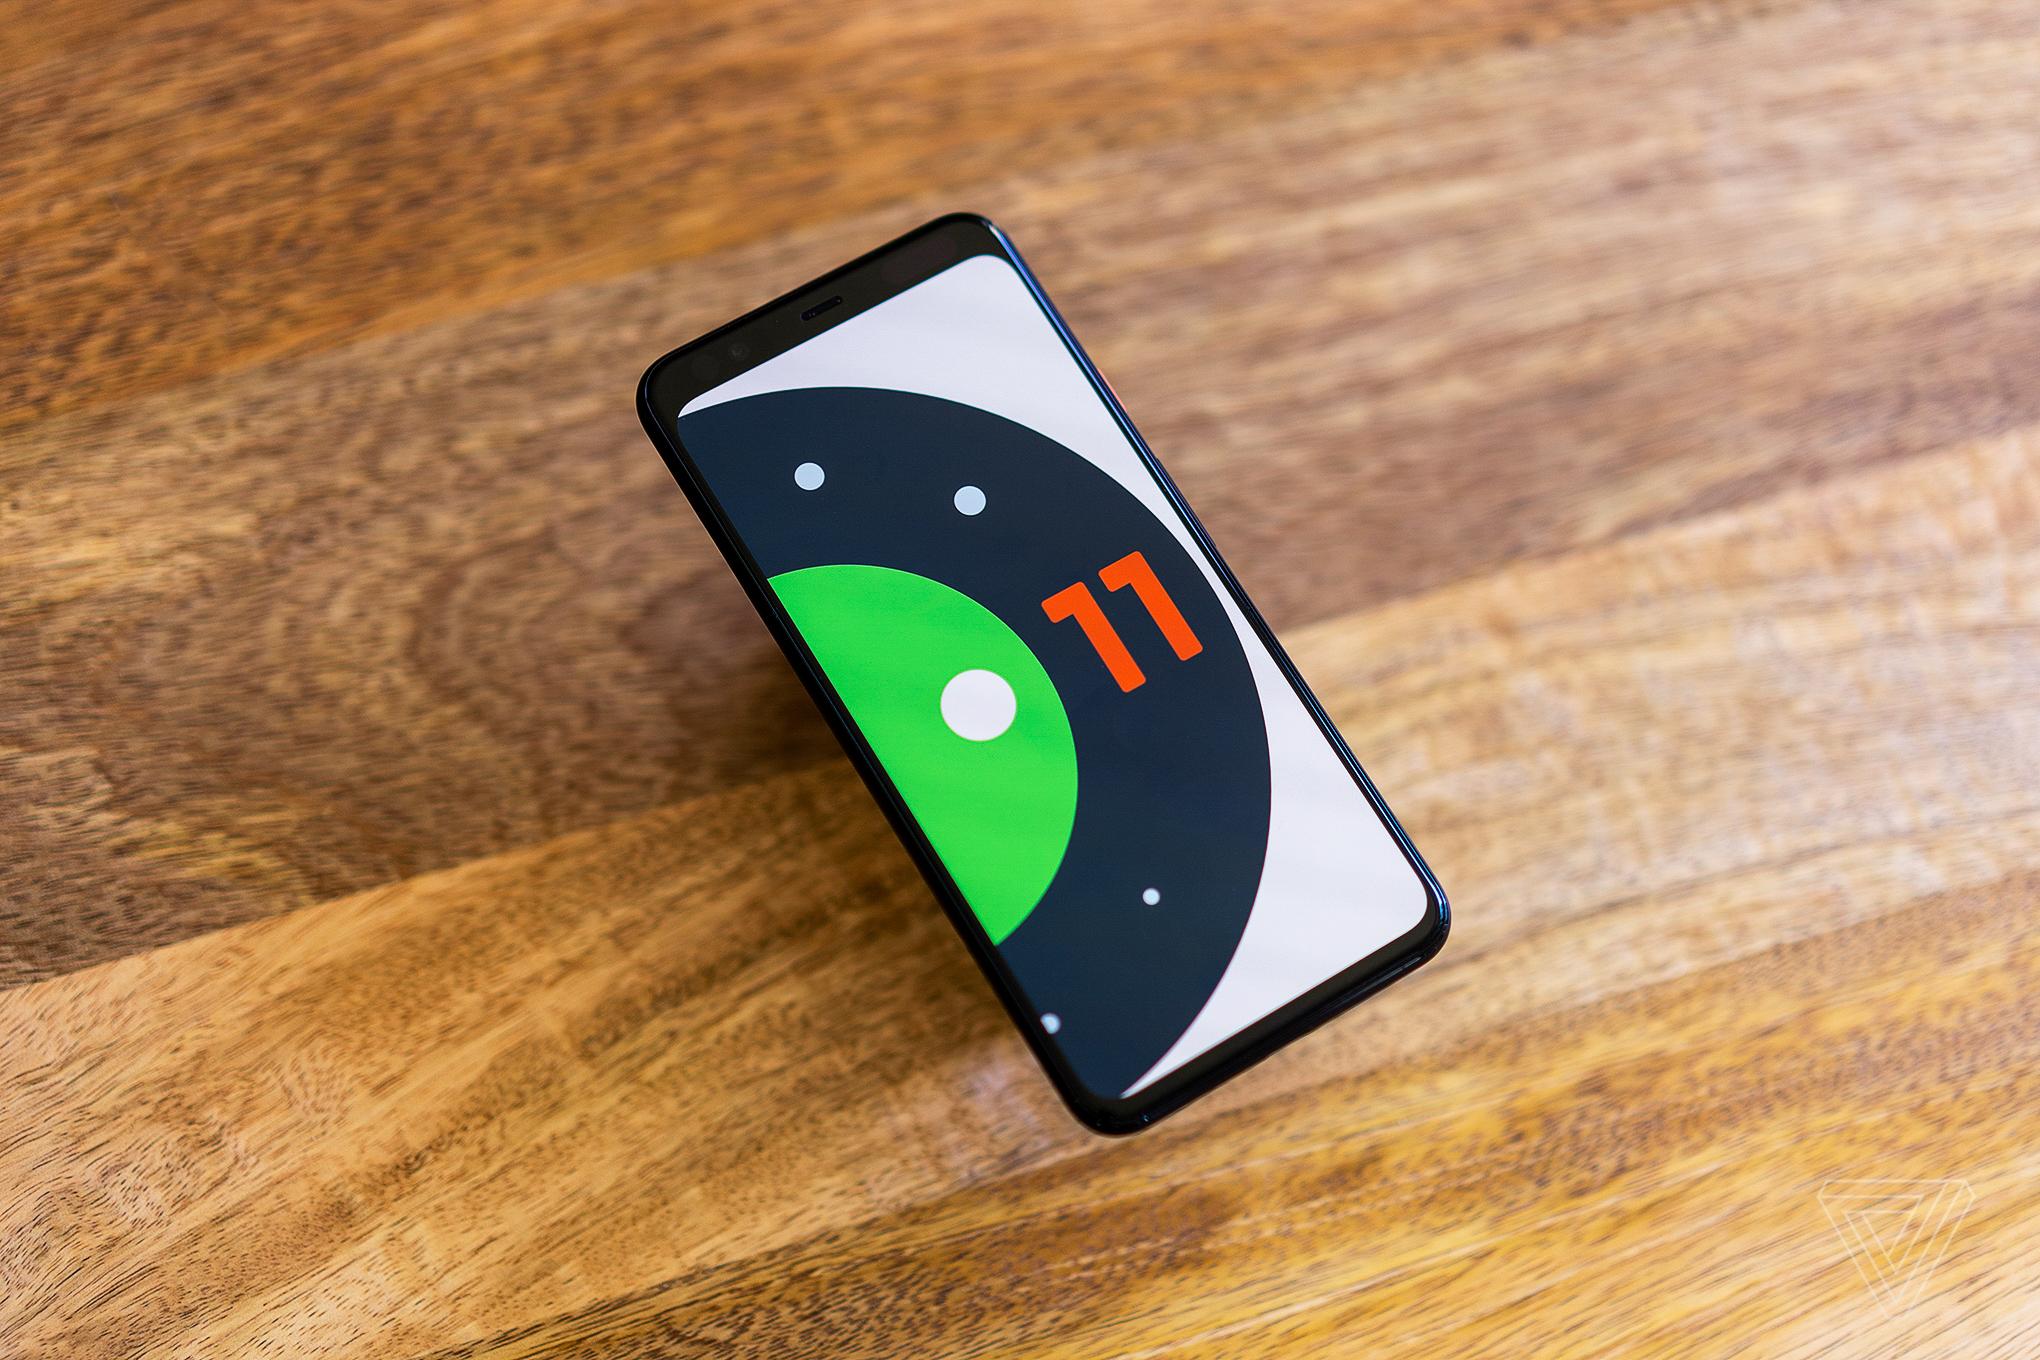 Phone displaying Android 11 Beta